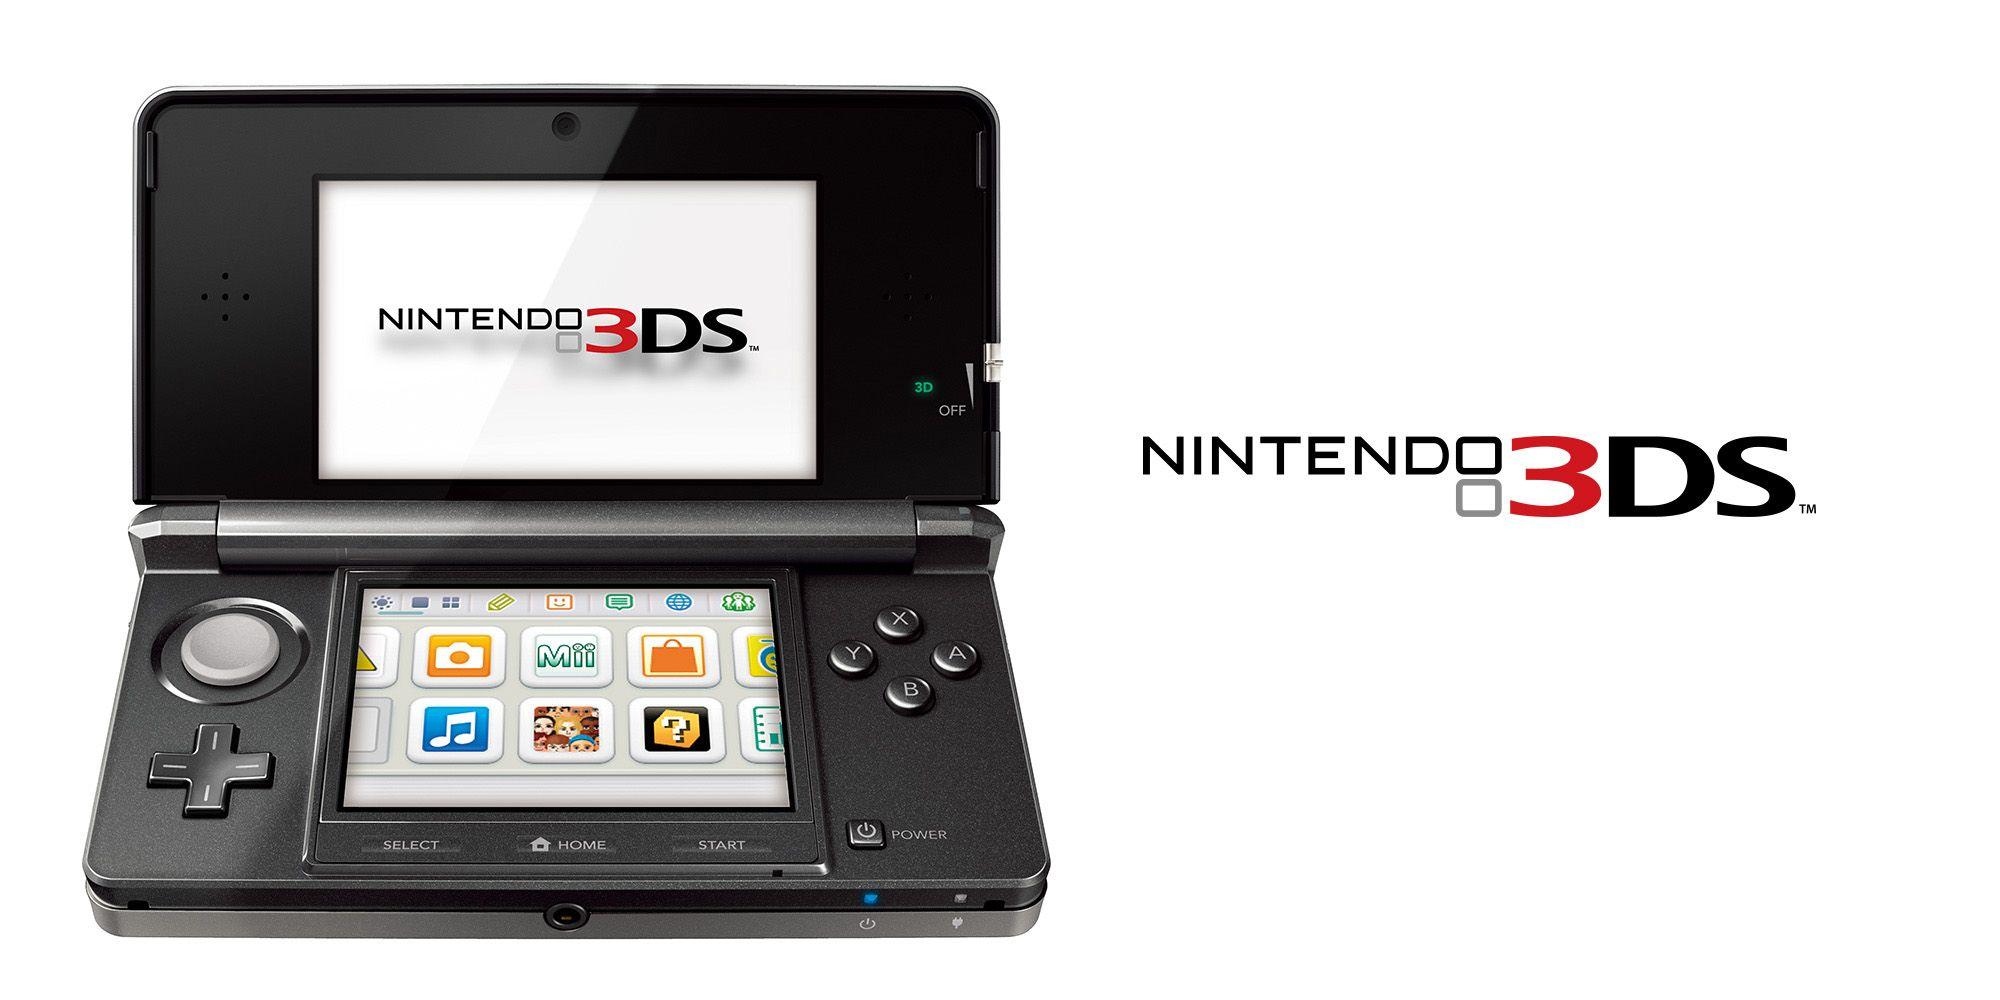 Nintendo Switch update makes the activity log a little bit better - Polygon